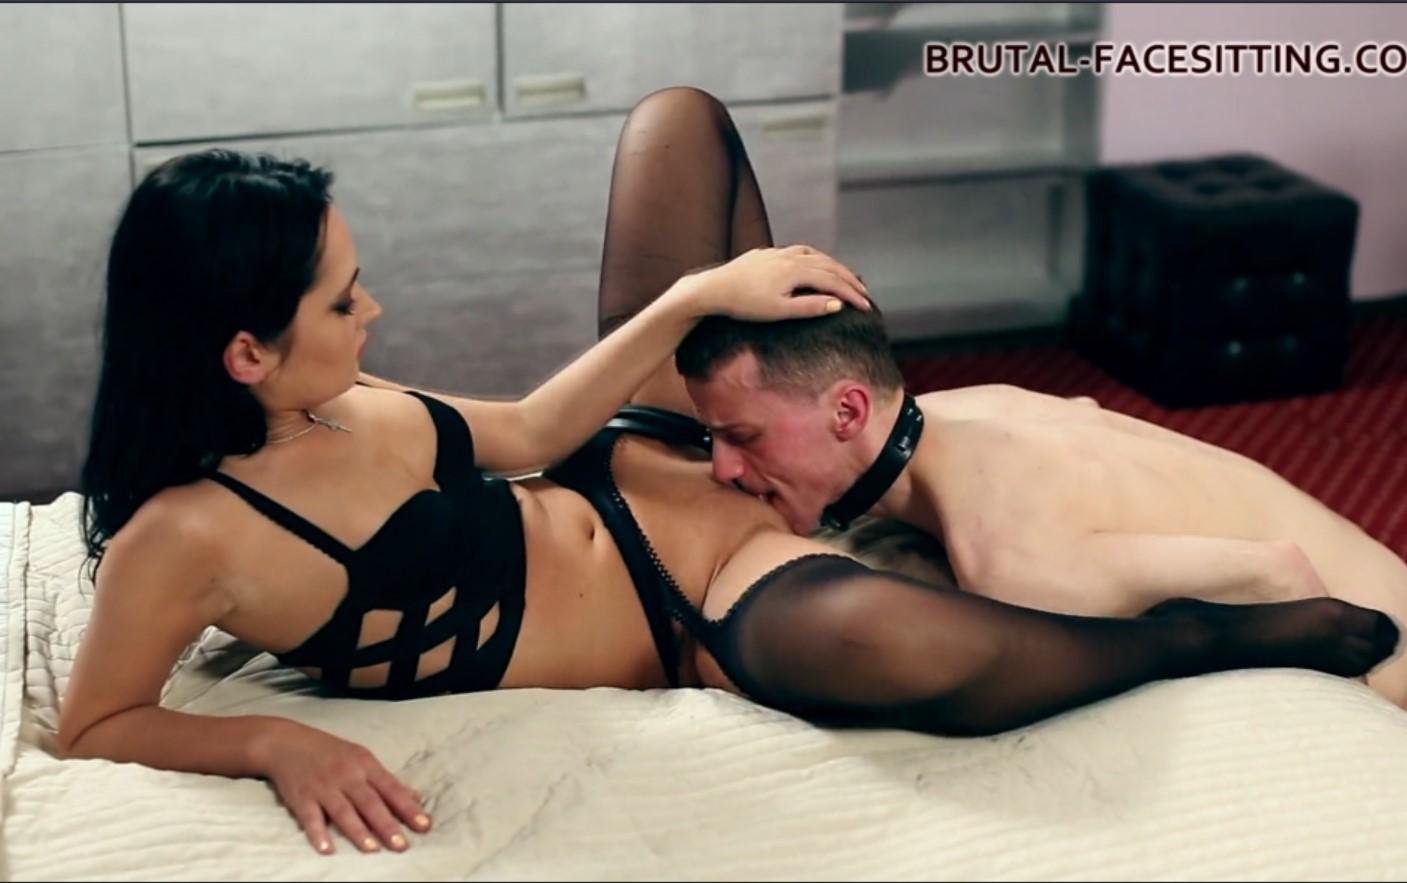 Angie Moon - 10 июня 2016 порно